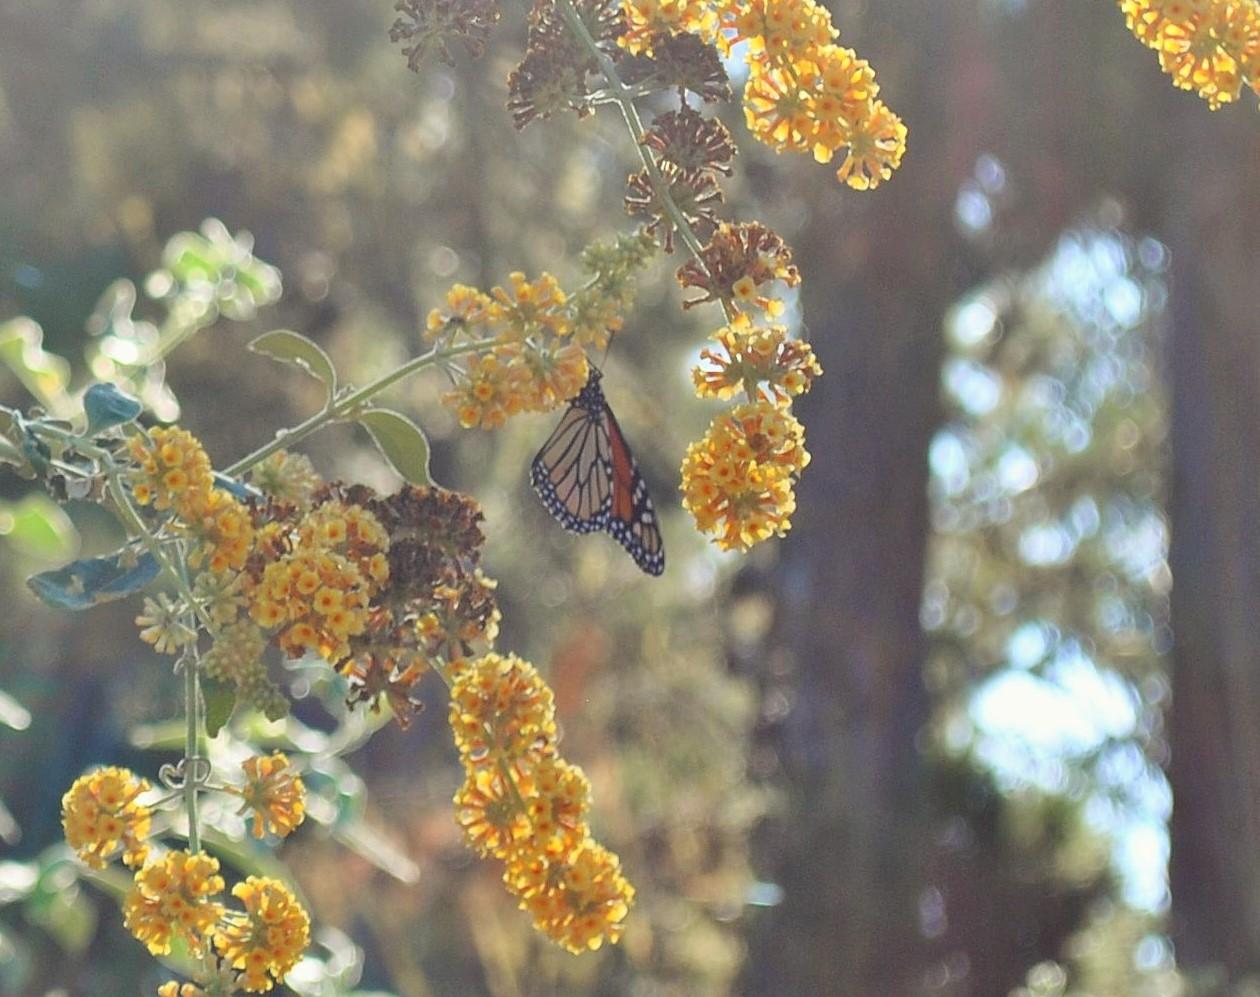 The 2015-2016 monarch season began in early October.